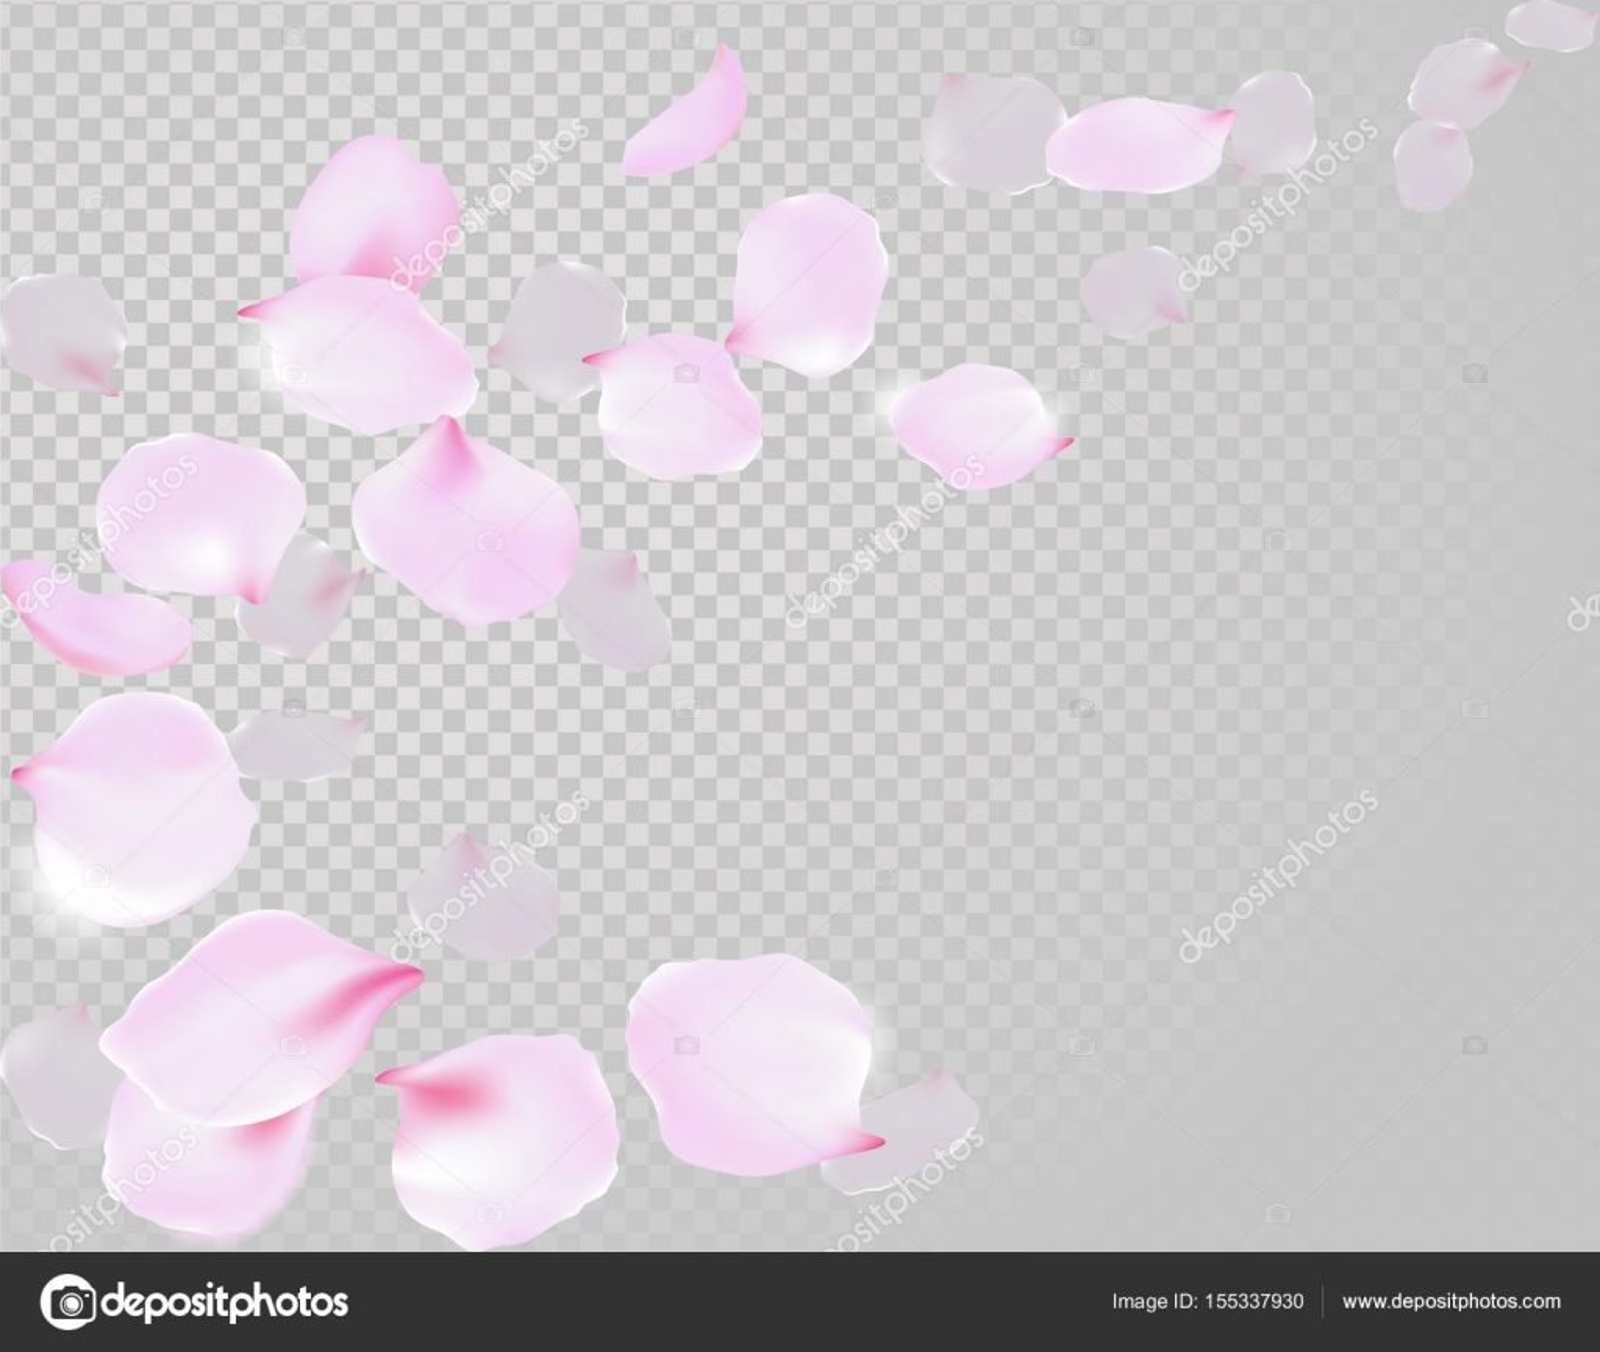 soft wallpaper background